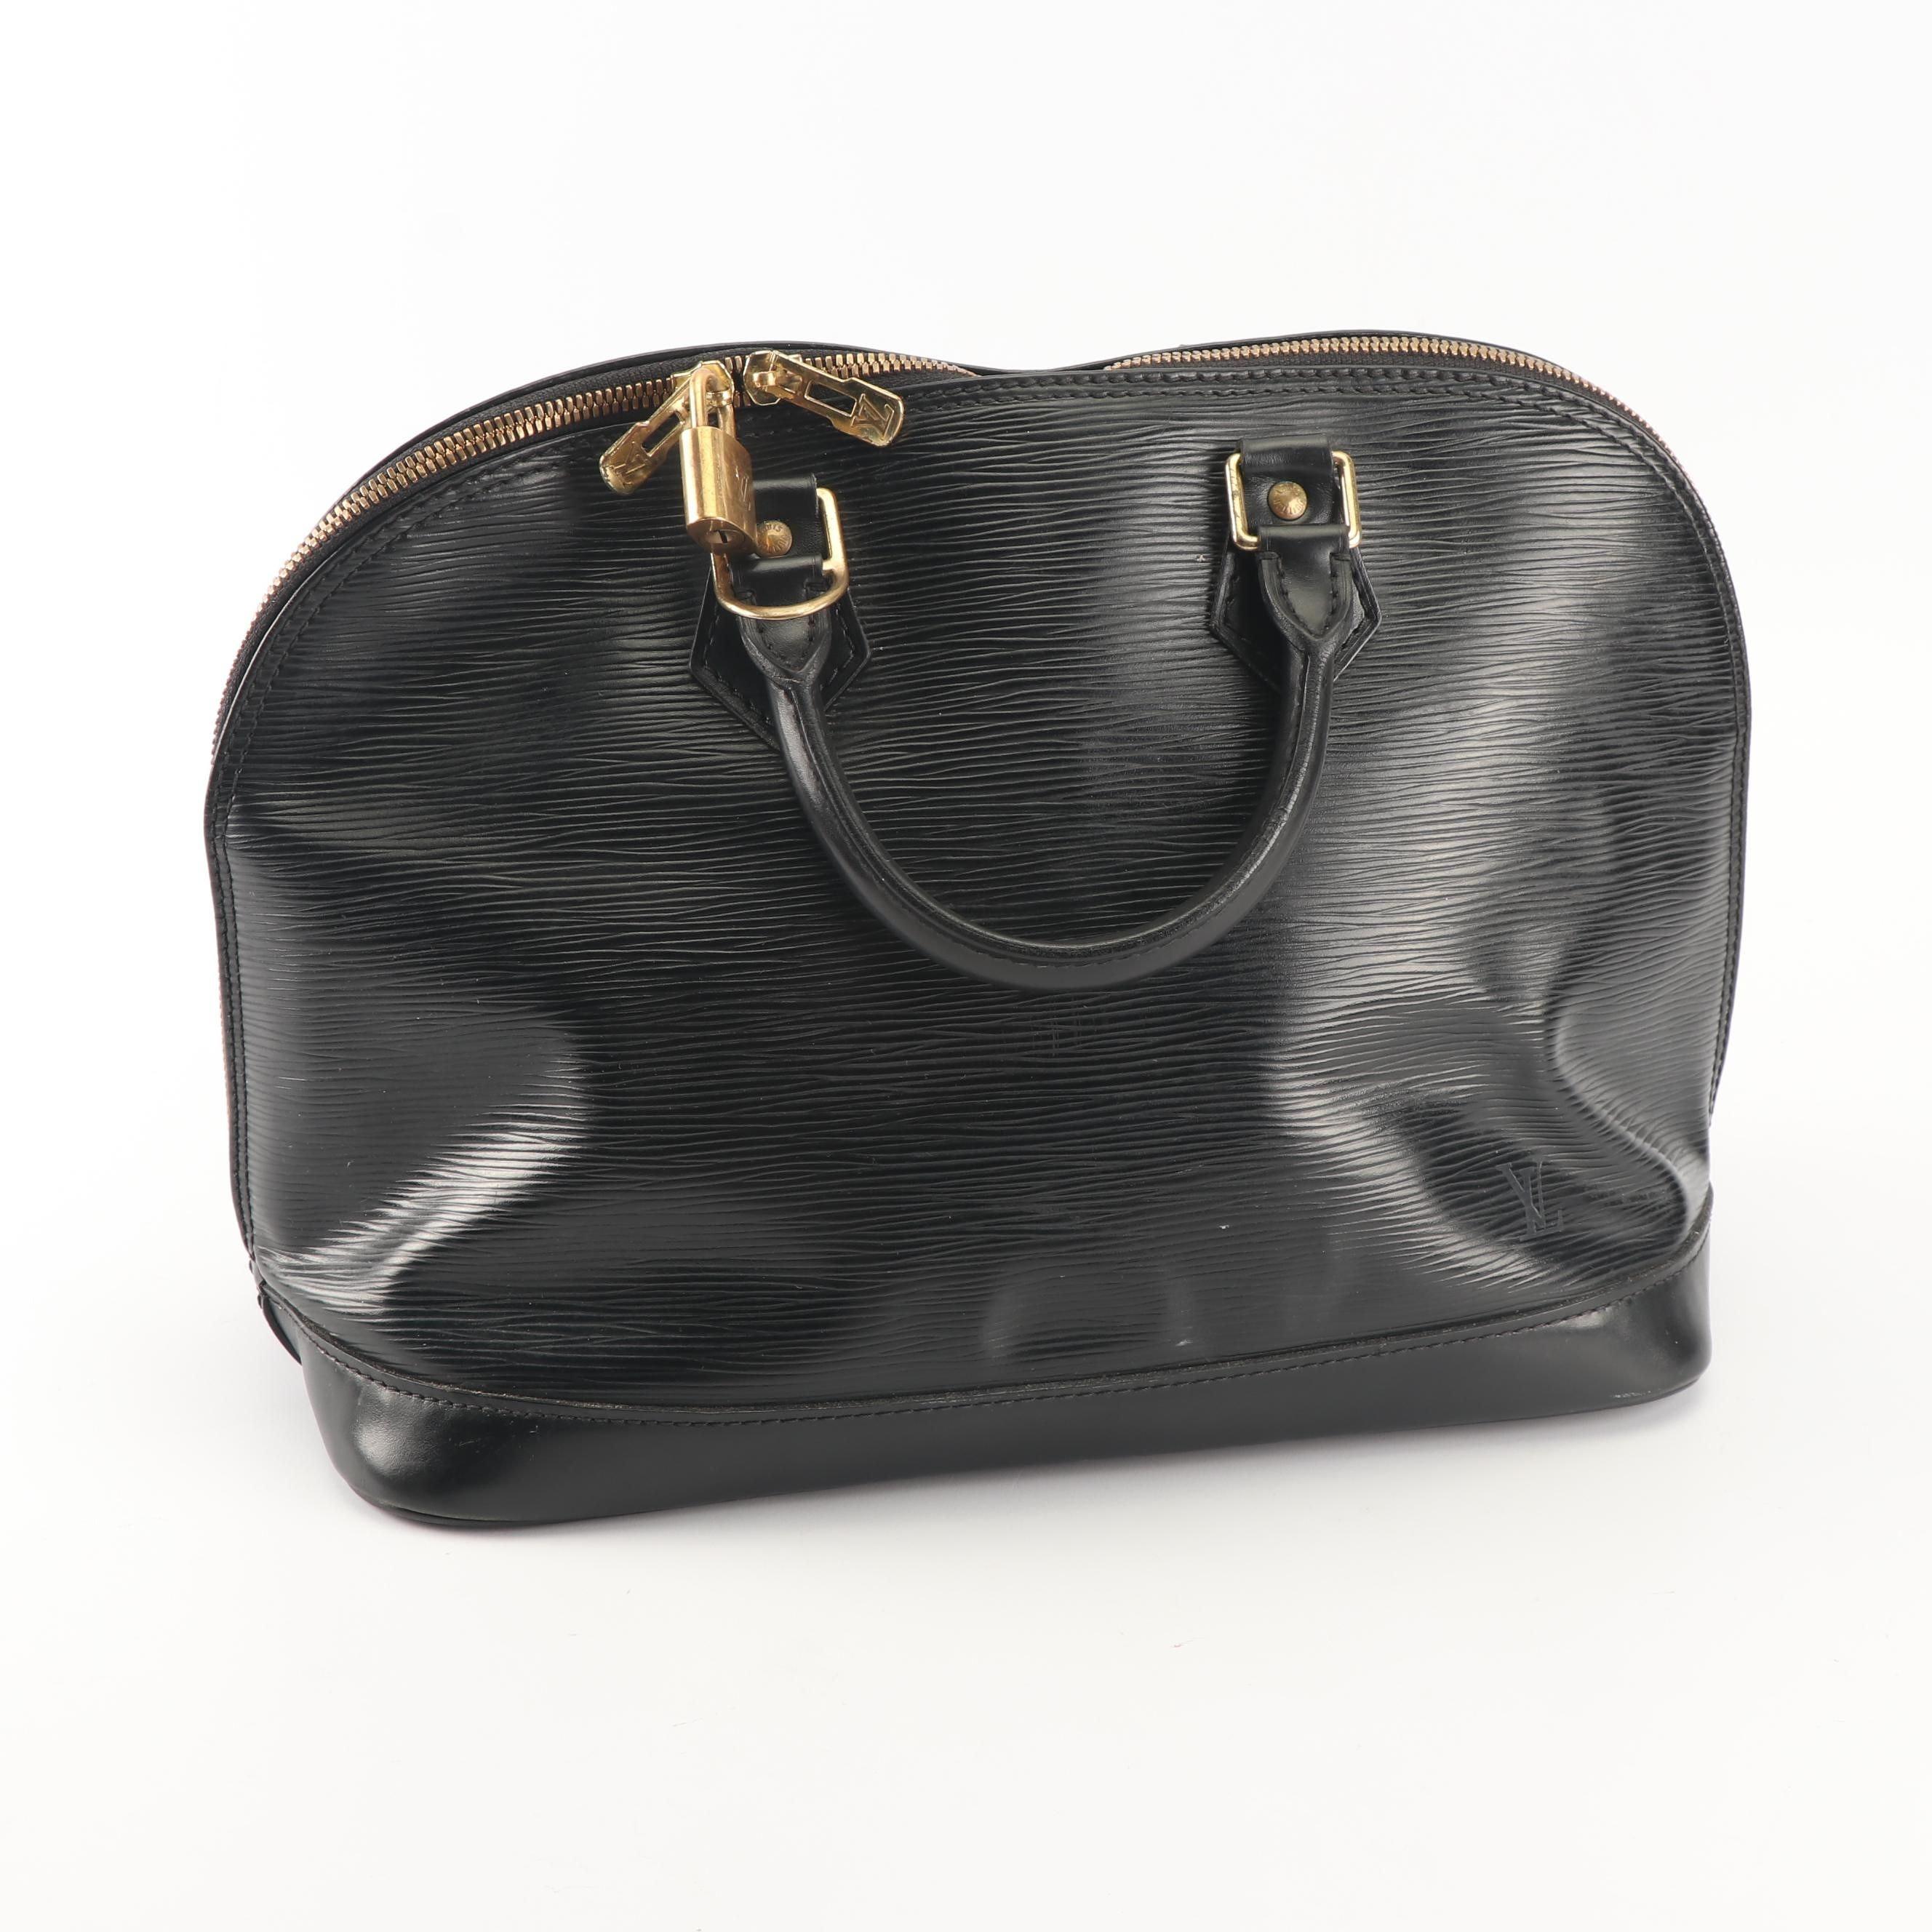 1996 Louis Vuitton Black Epi Leather Alma PM Satchel